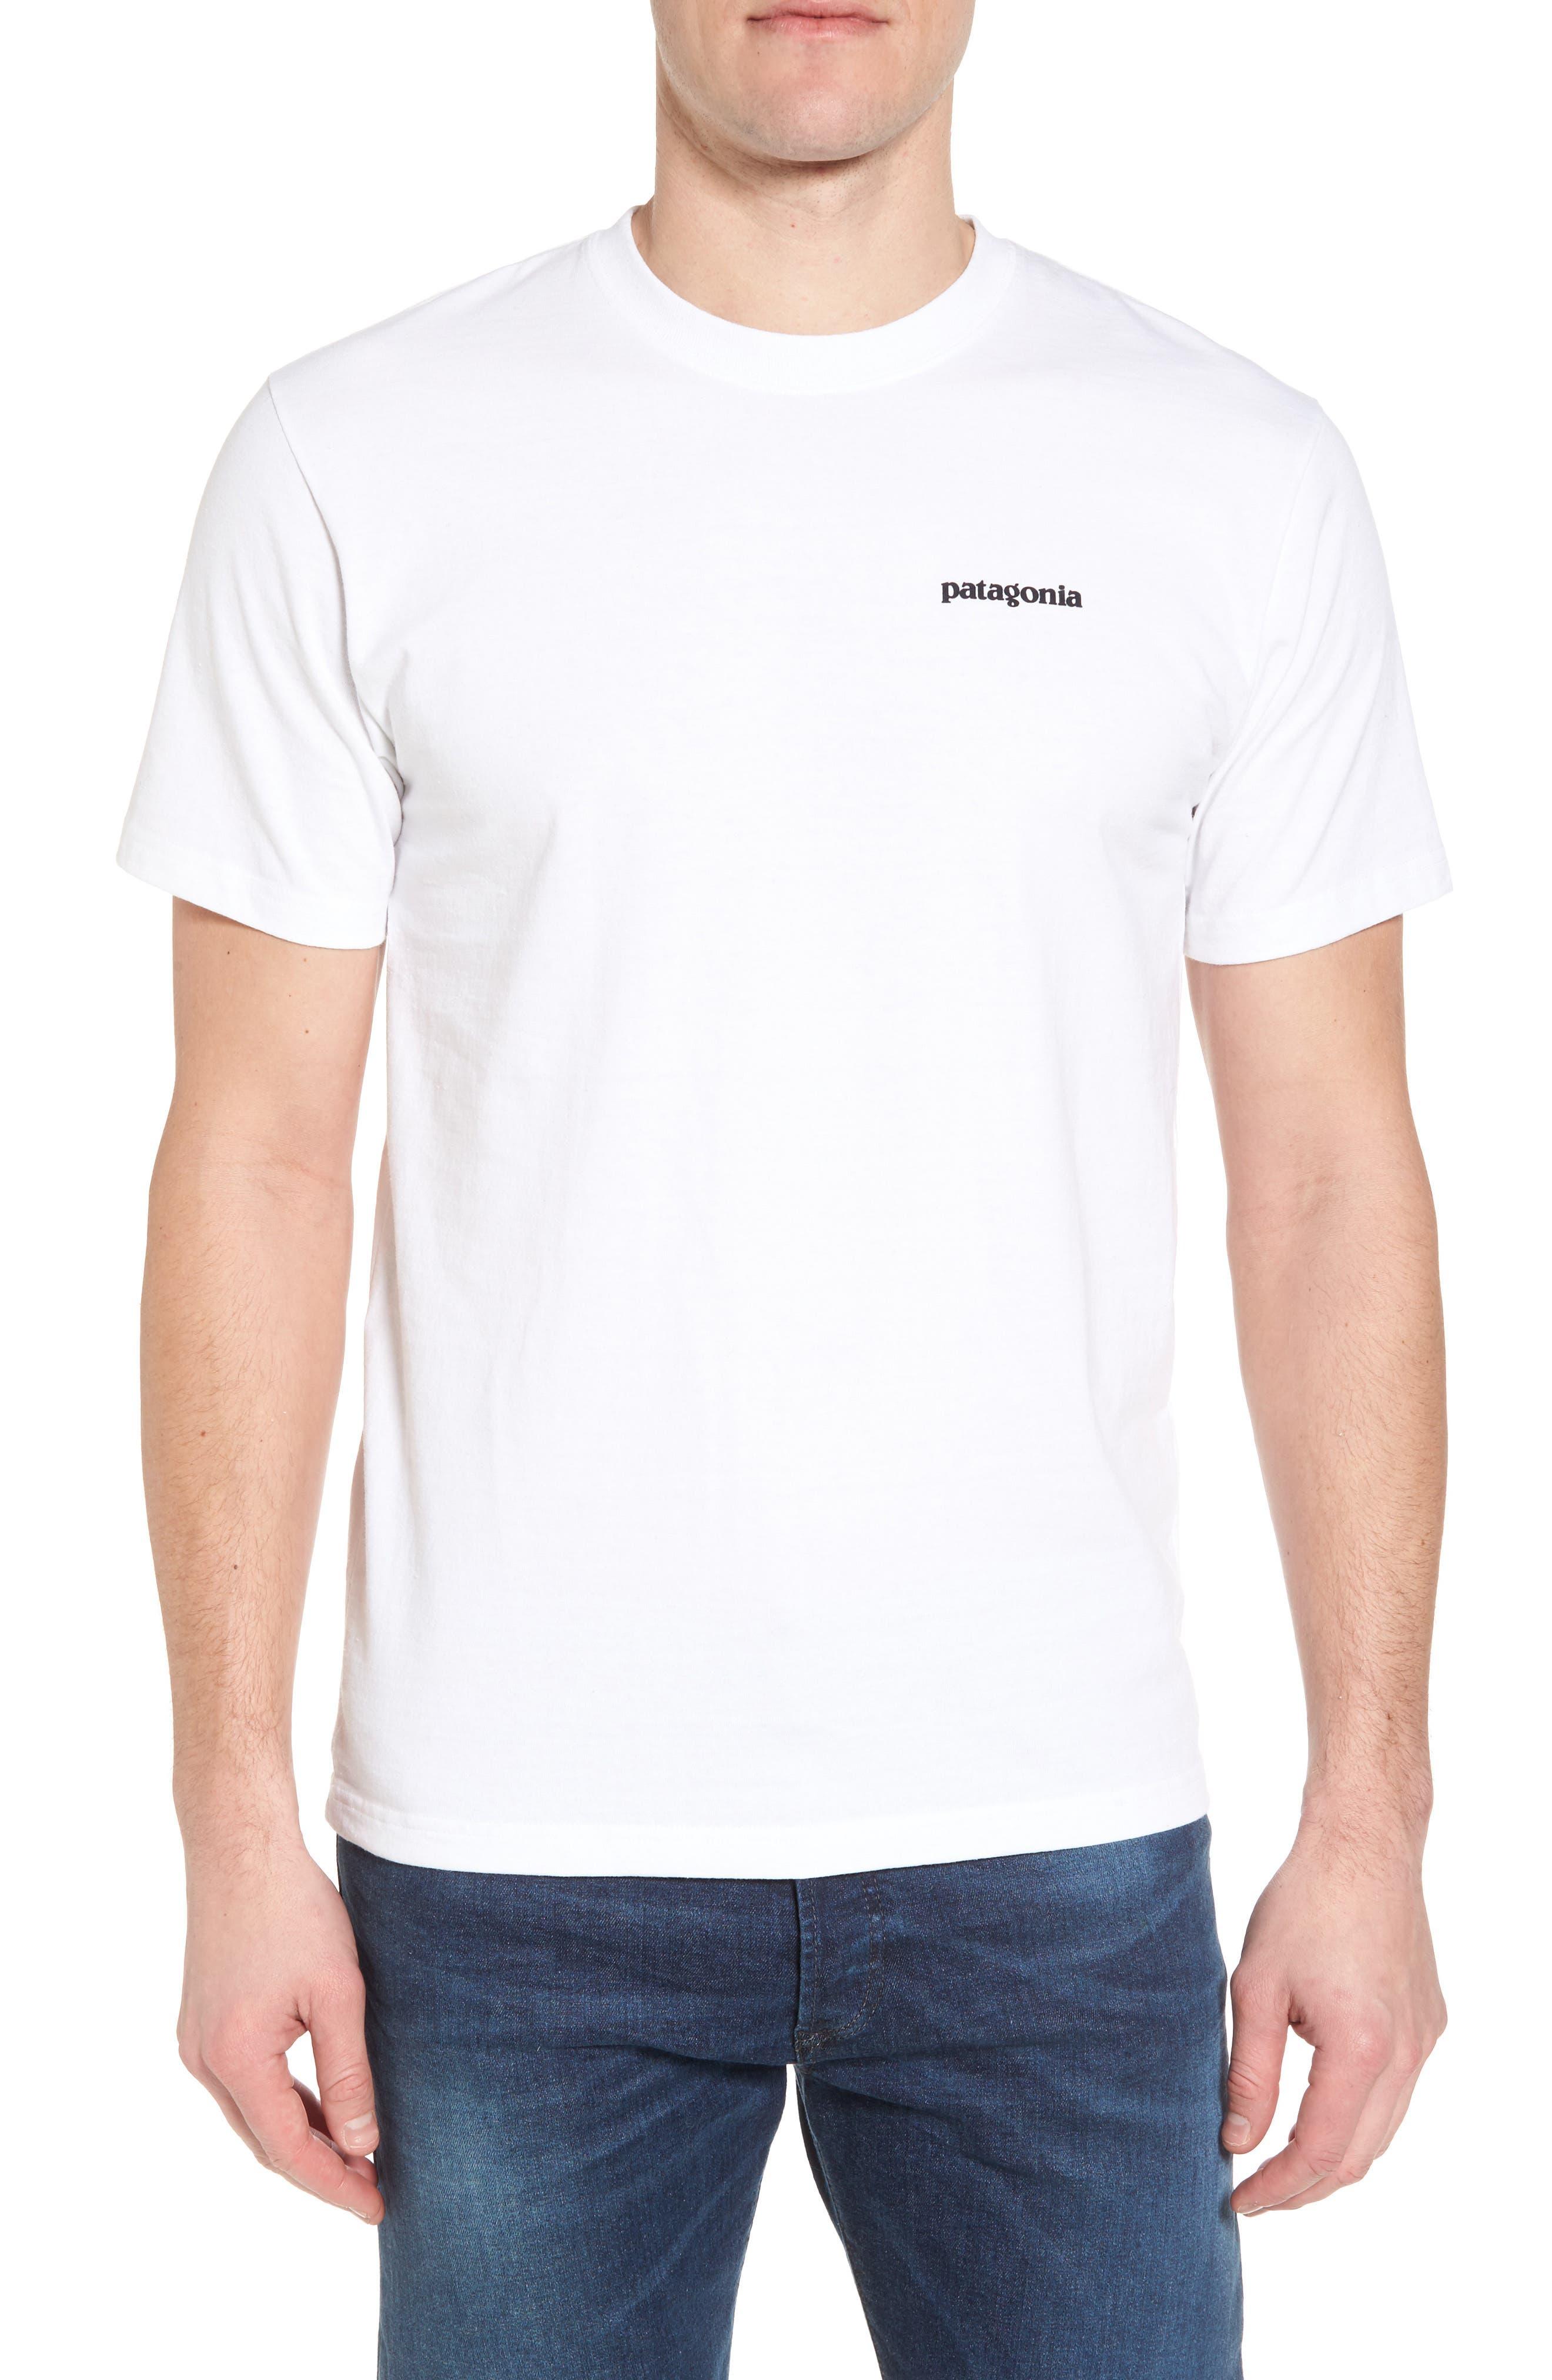 Patagonia Responsibili-Tee T-Shirt, White